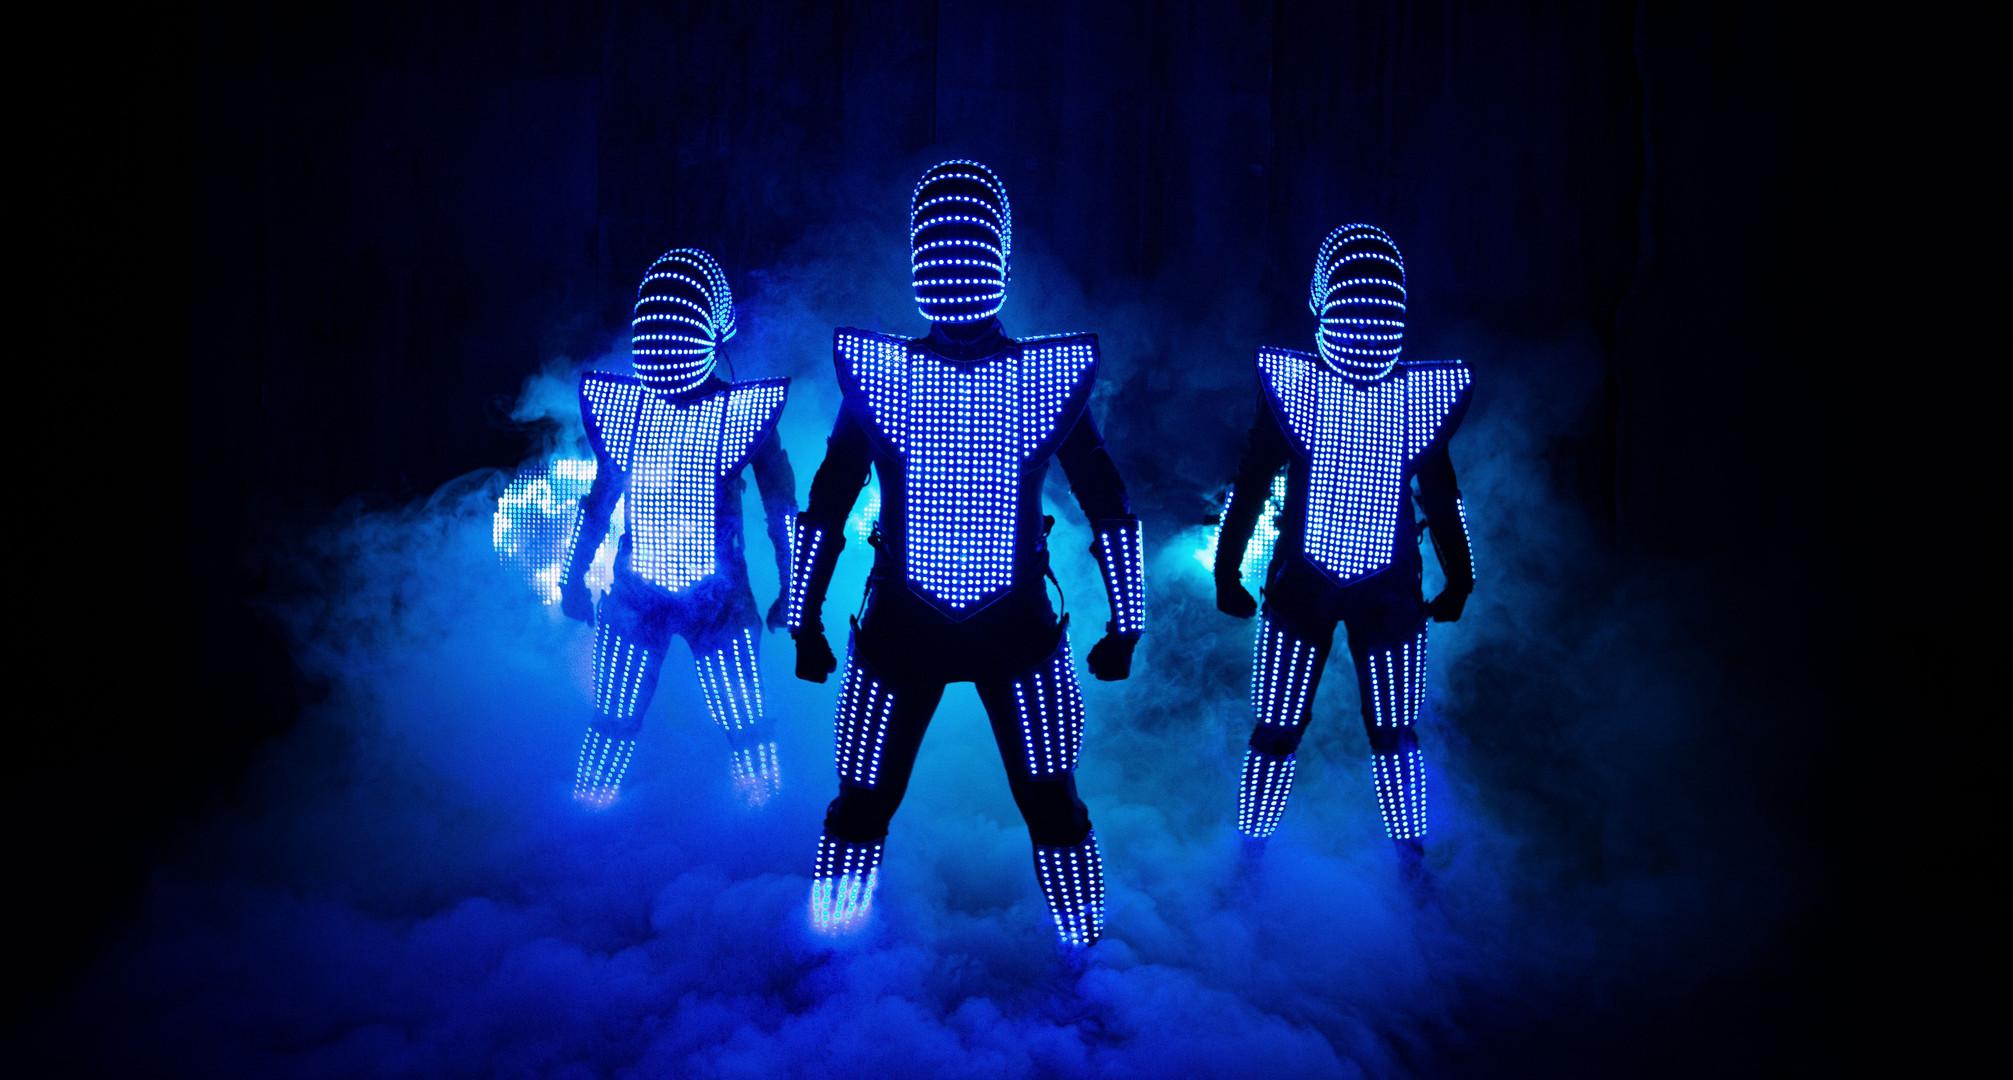 LED Aliens walking though